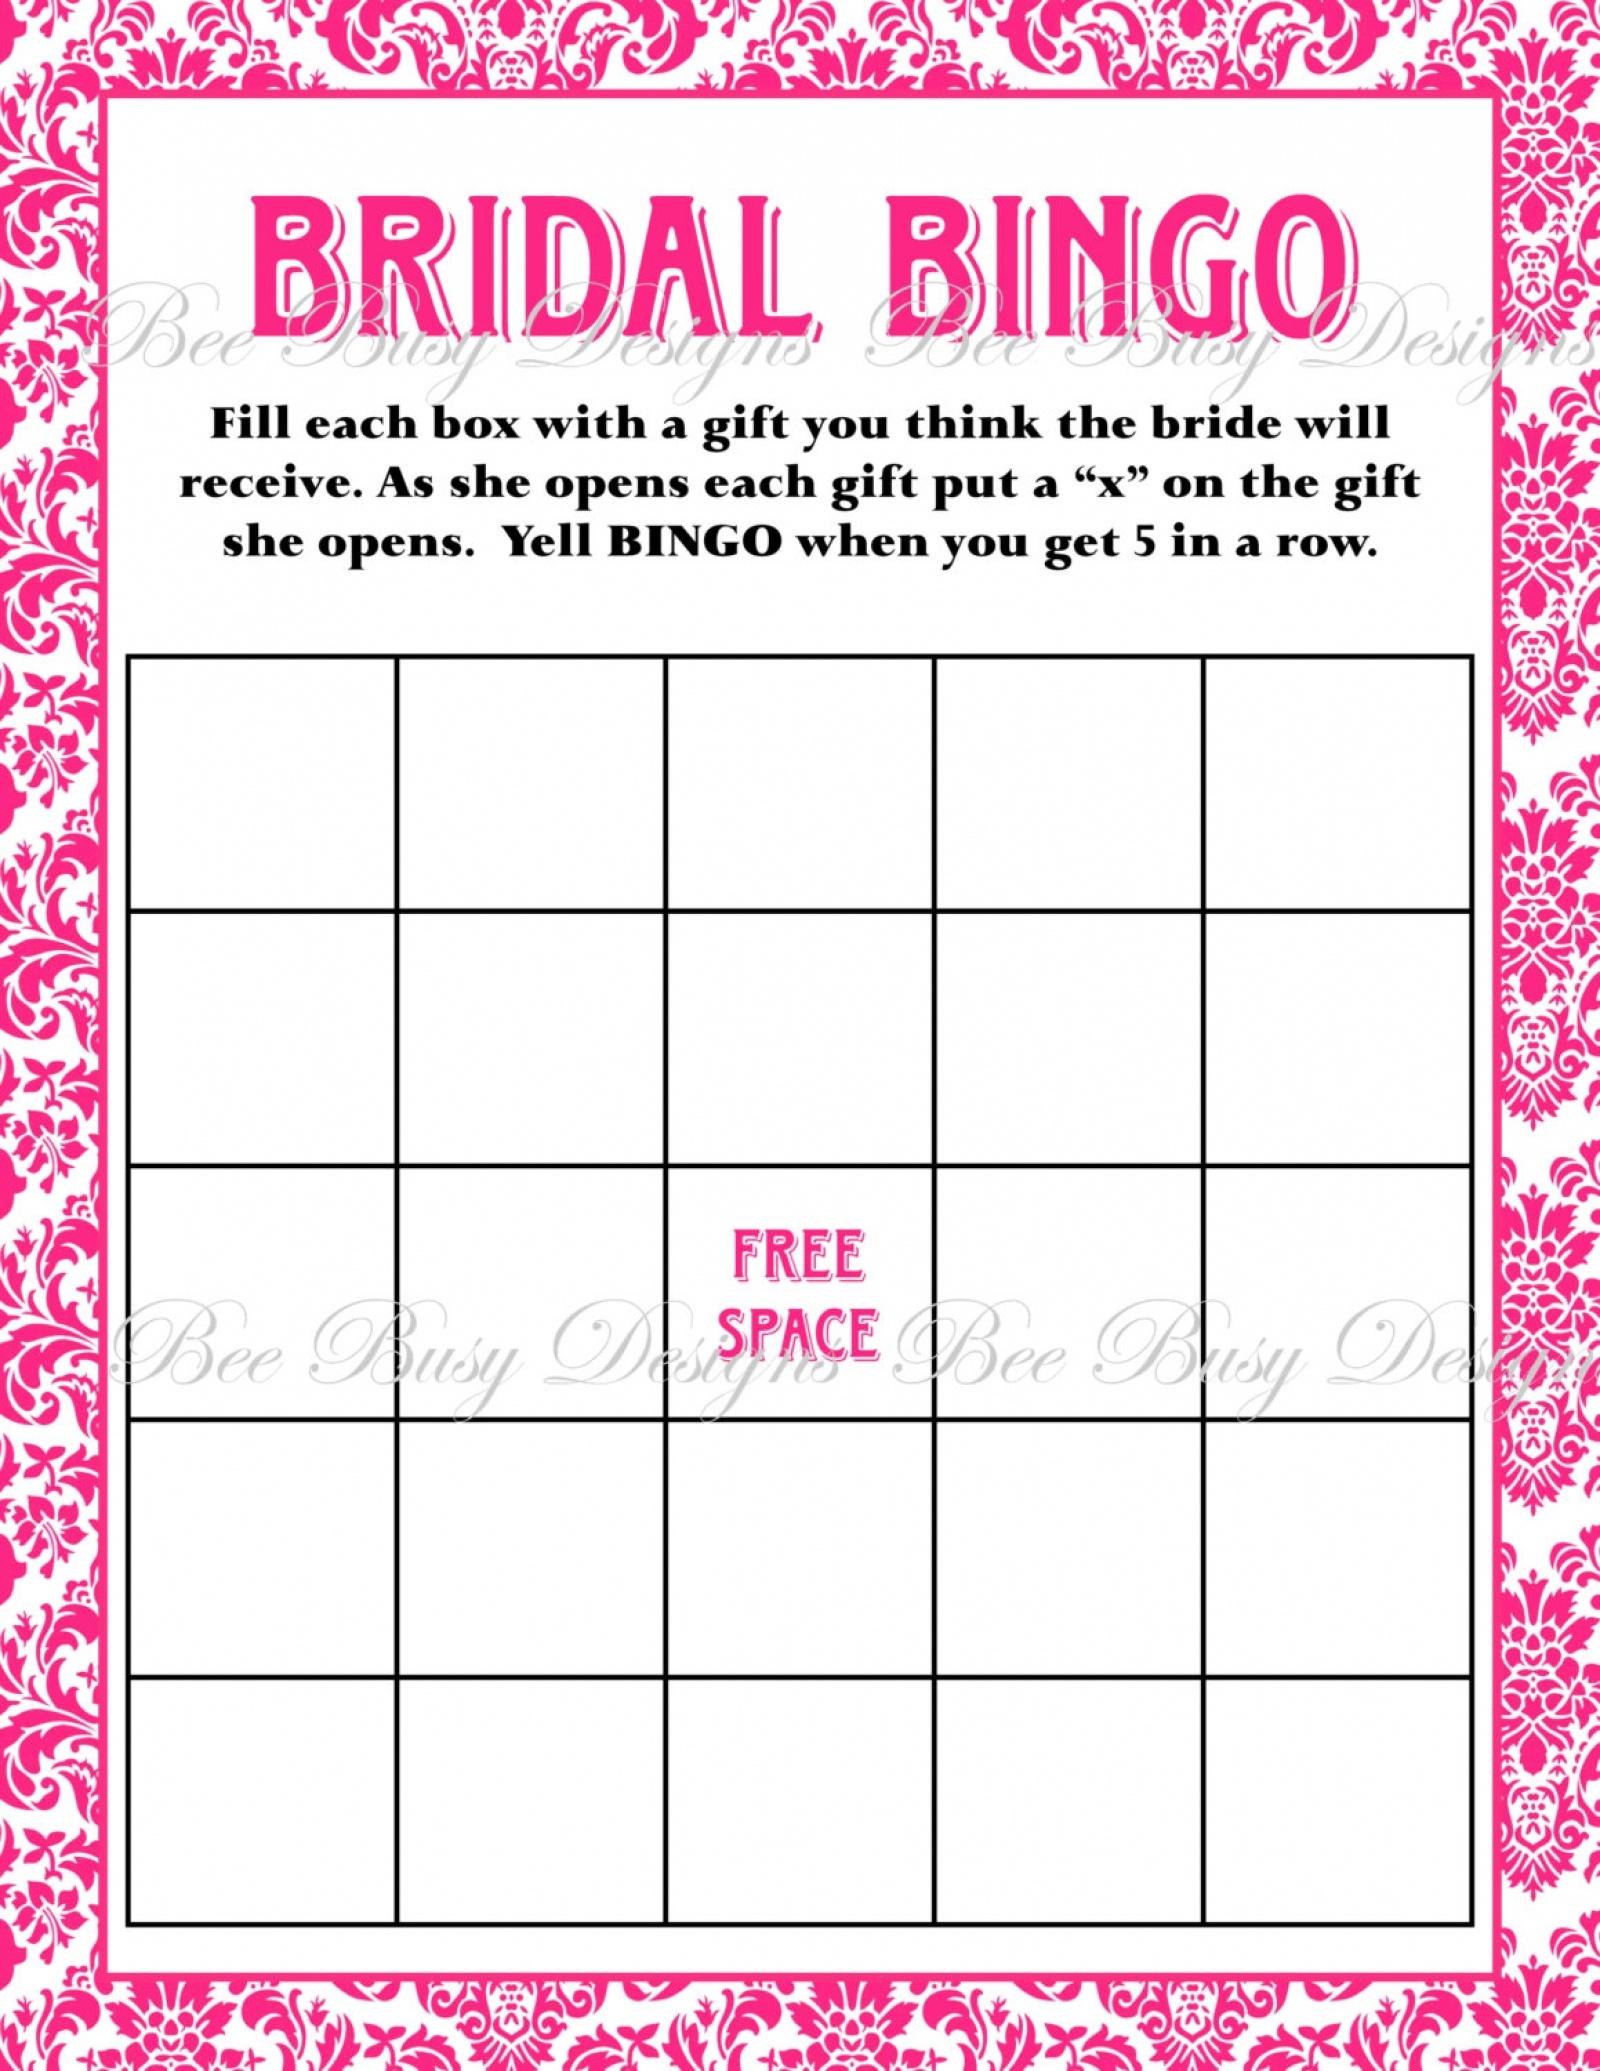 Printable Hot Pink Damask Bridal Shower Bingo Game Instant Download - Free Printable Bridal Shower Blank Bingo Games